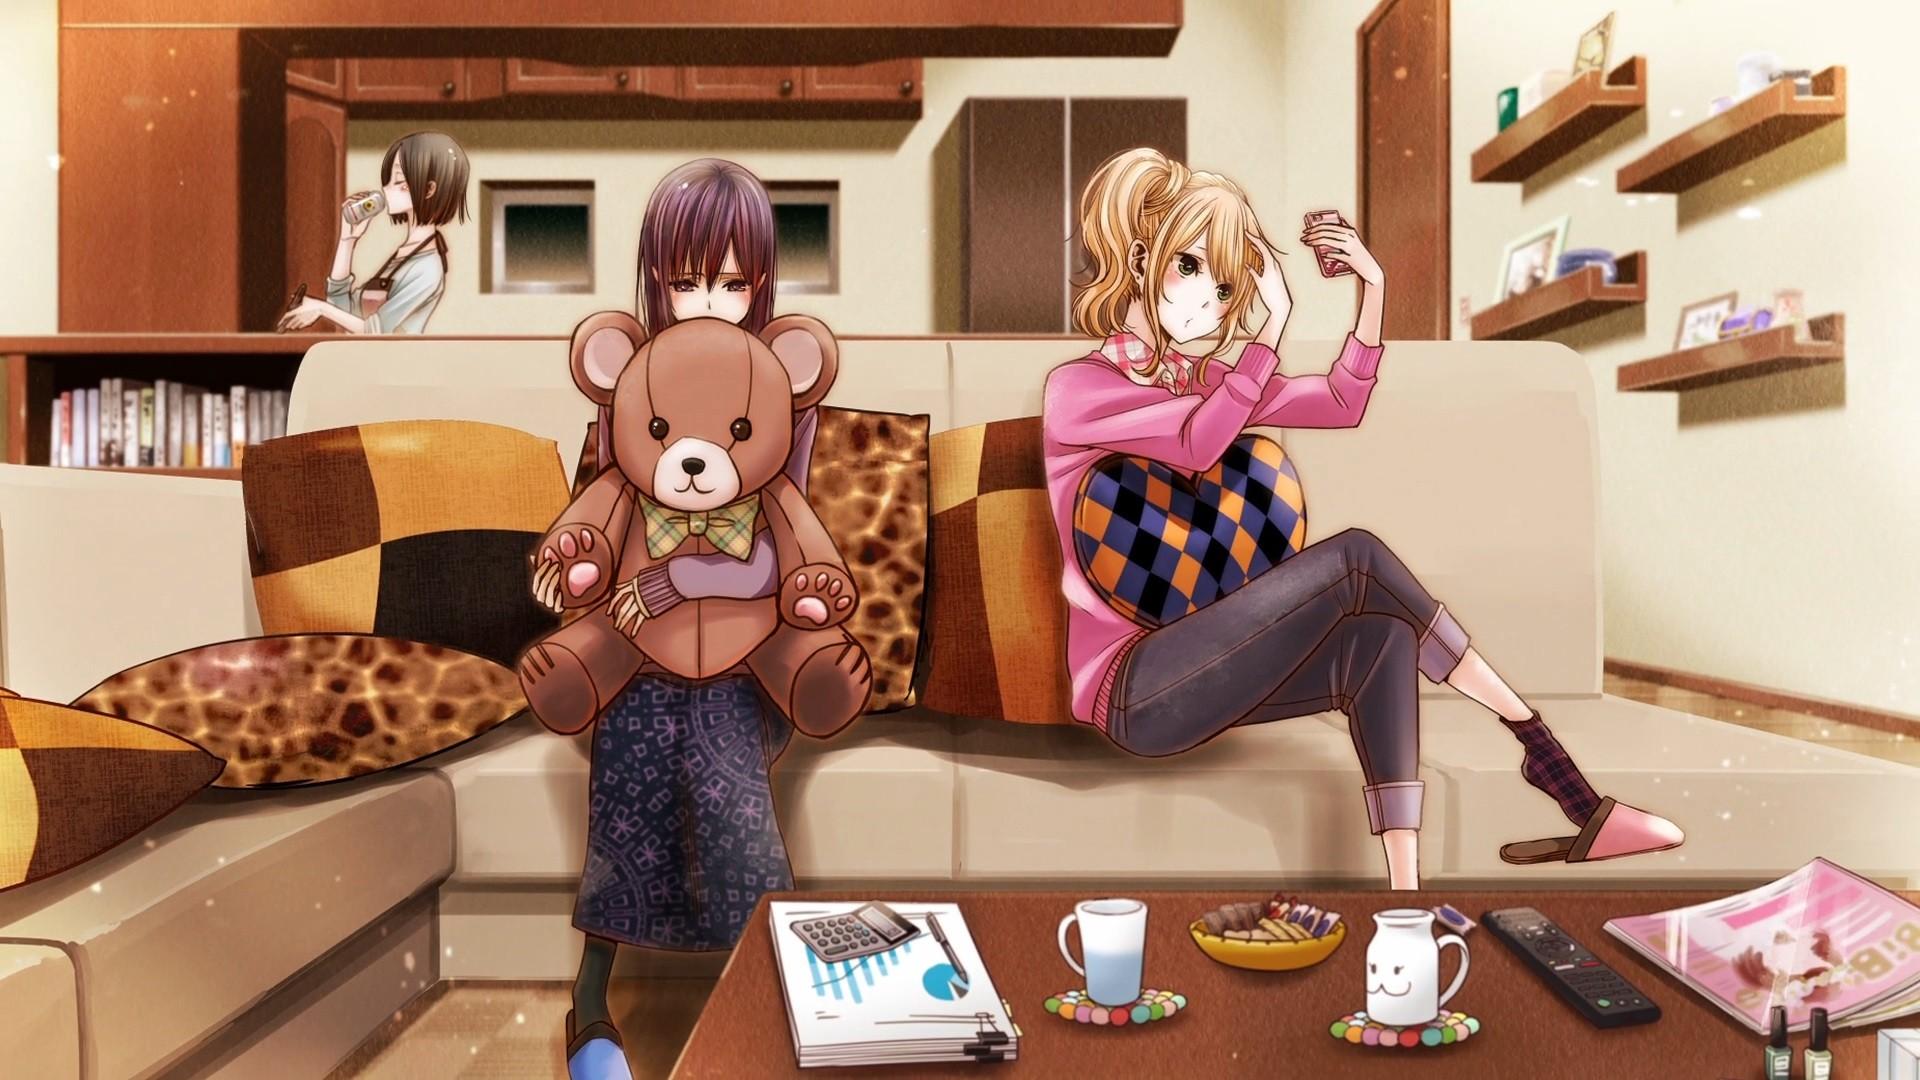 Citrus Anime download wallpaper image